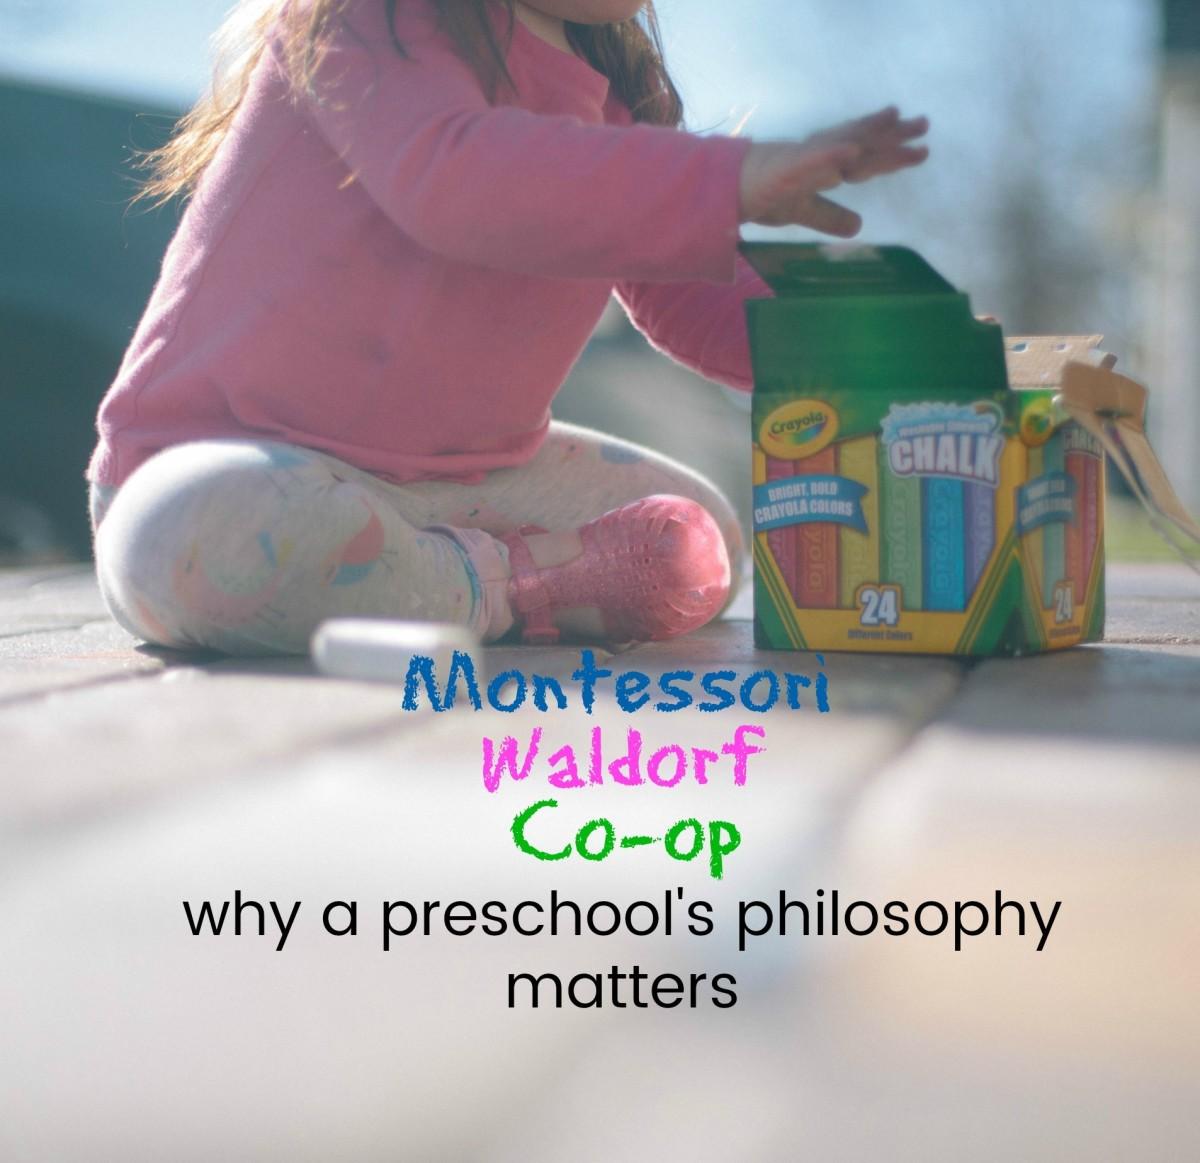 Montessori, Waldorf, & Co-Op: What Preschool Philosophy Fits Your Family?